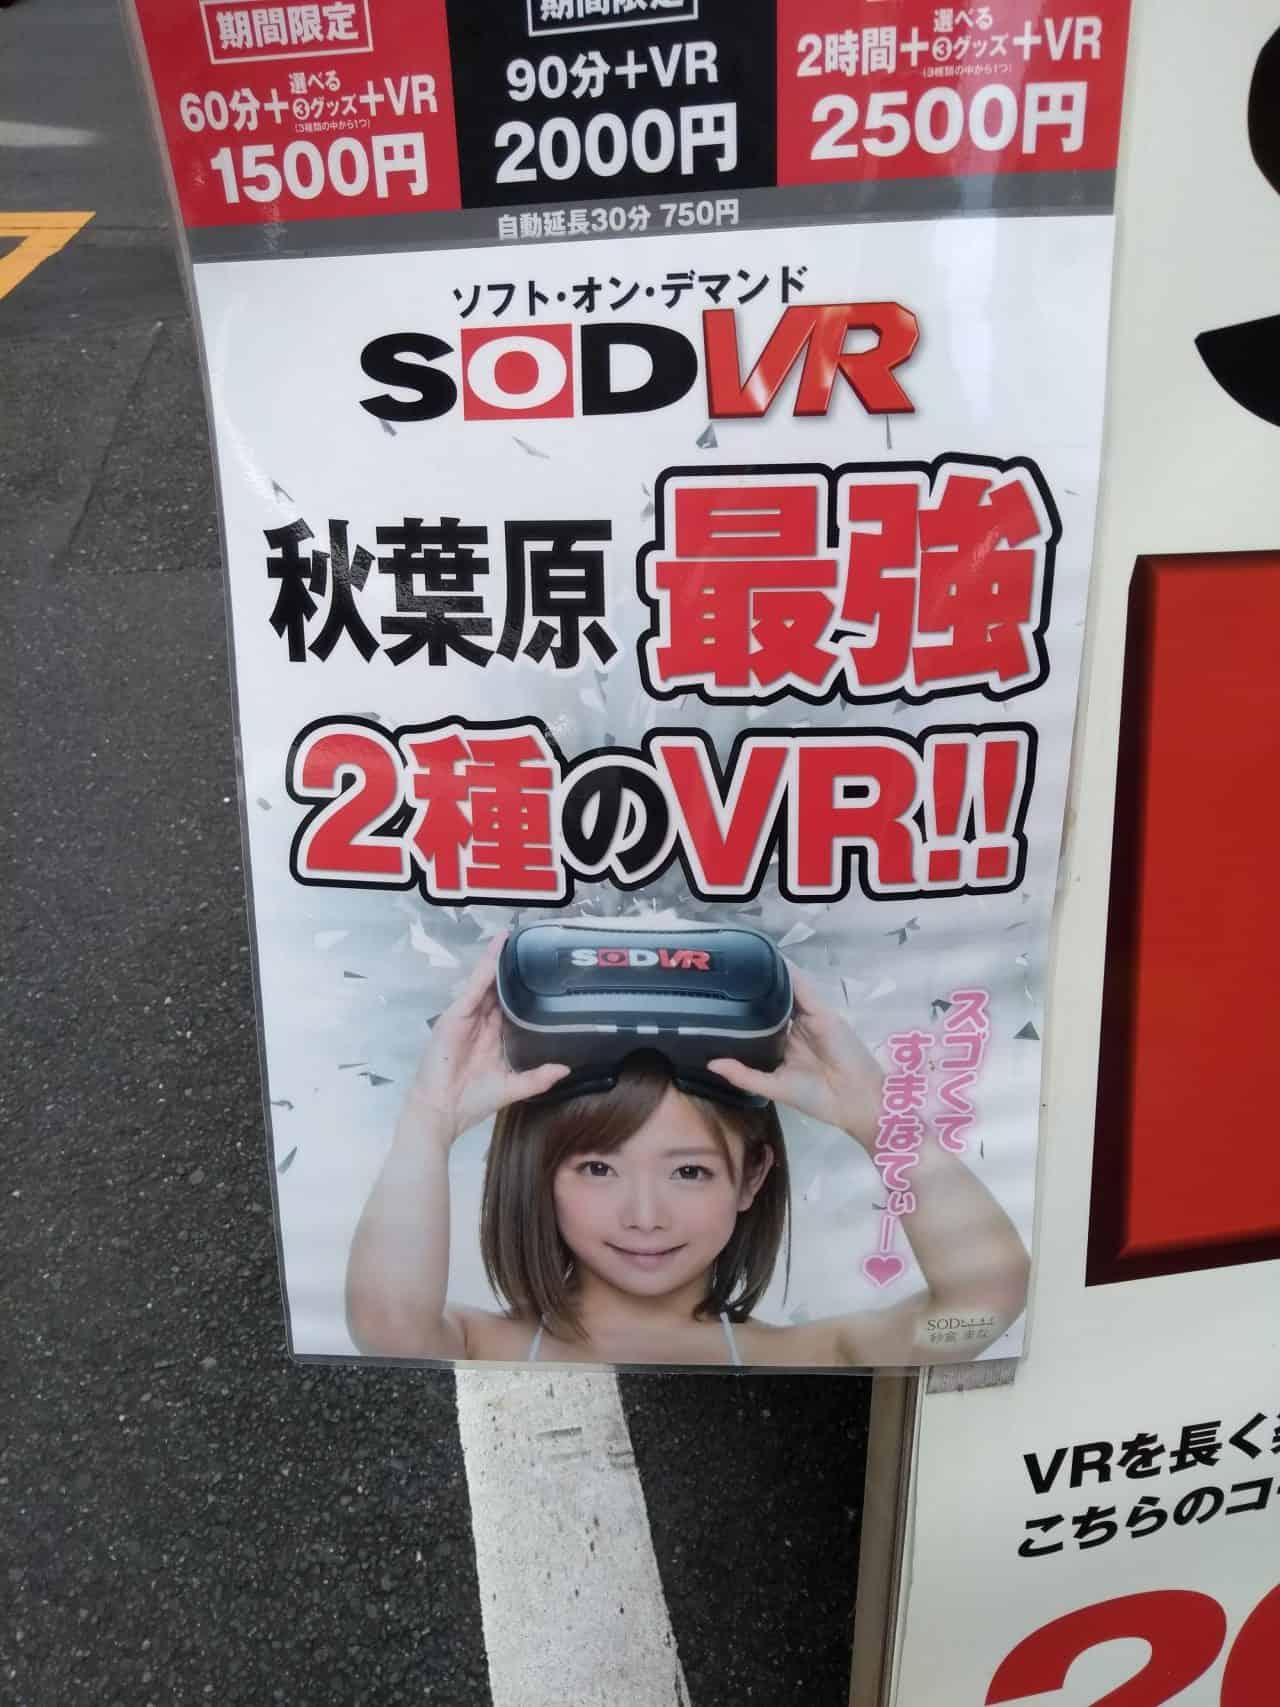 SOD VR